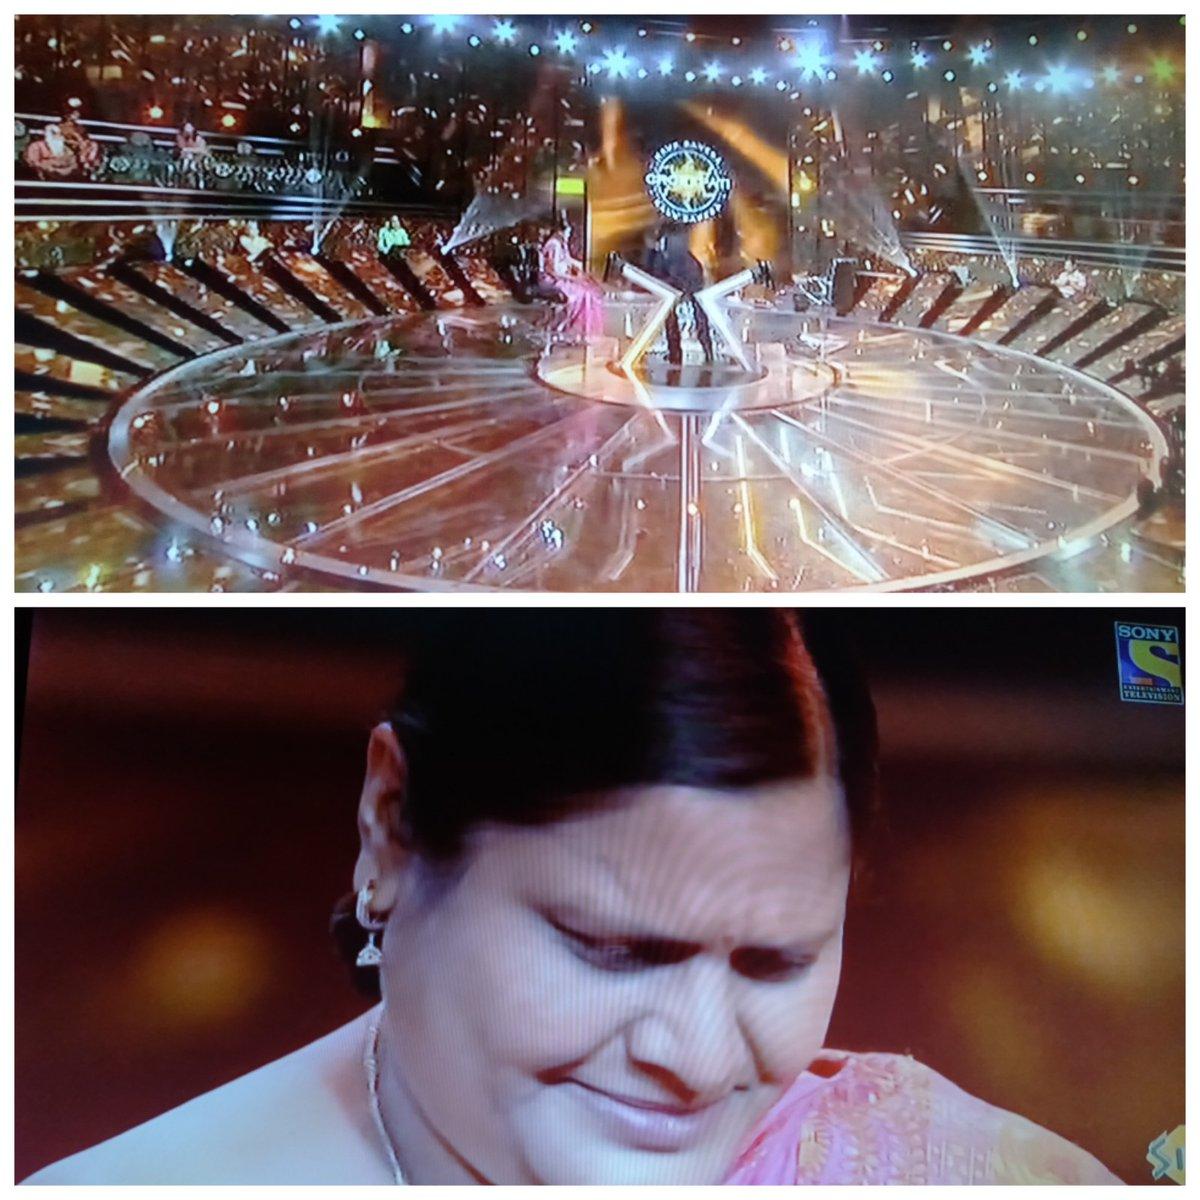 Again Women's power Win 1 crore today's.This is the third women in #kbc12 win 1 crore. Many congrats Anupa Das 💐🙏. @sachin_rt @SrBachchan @SonyTV @paro_sachinist @Shebas_10dulkar @ankushsachinist @piyu_sachinist @akshusachinist